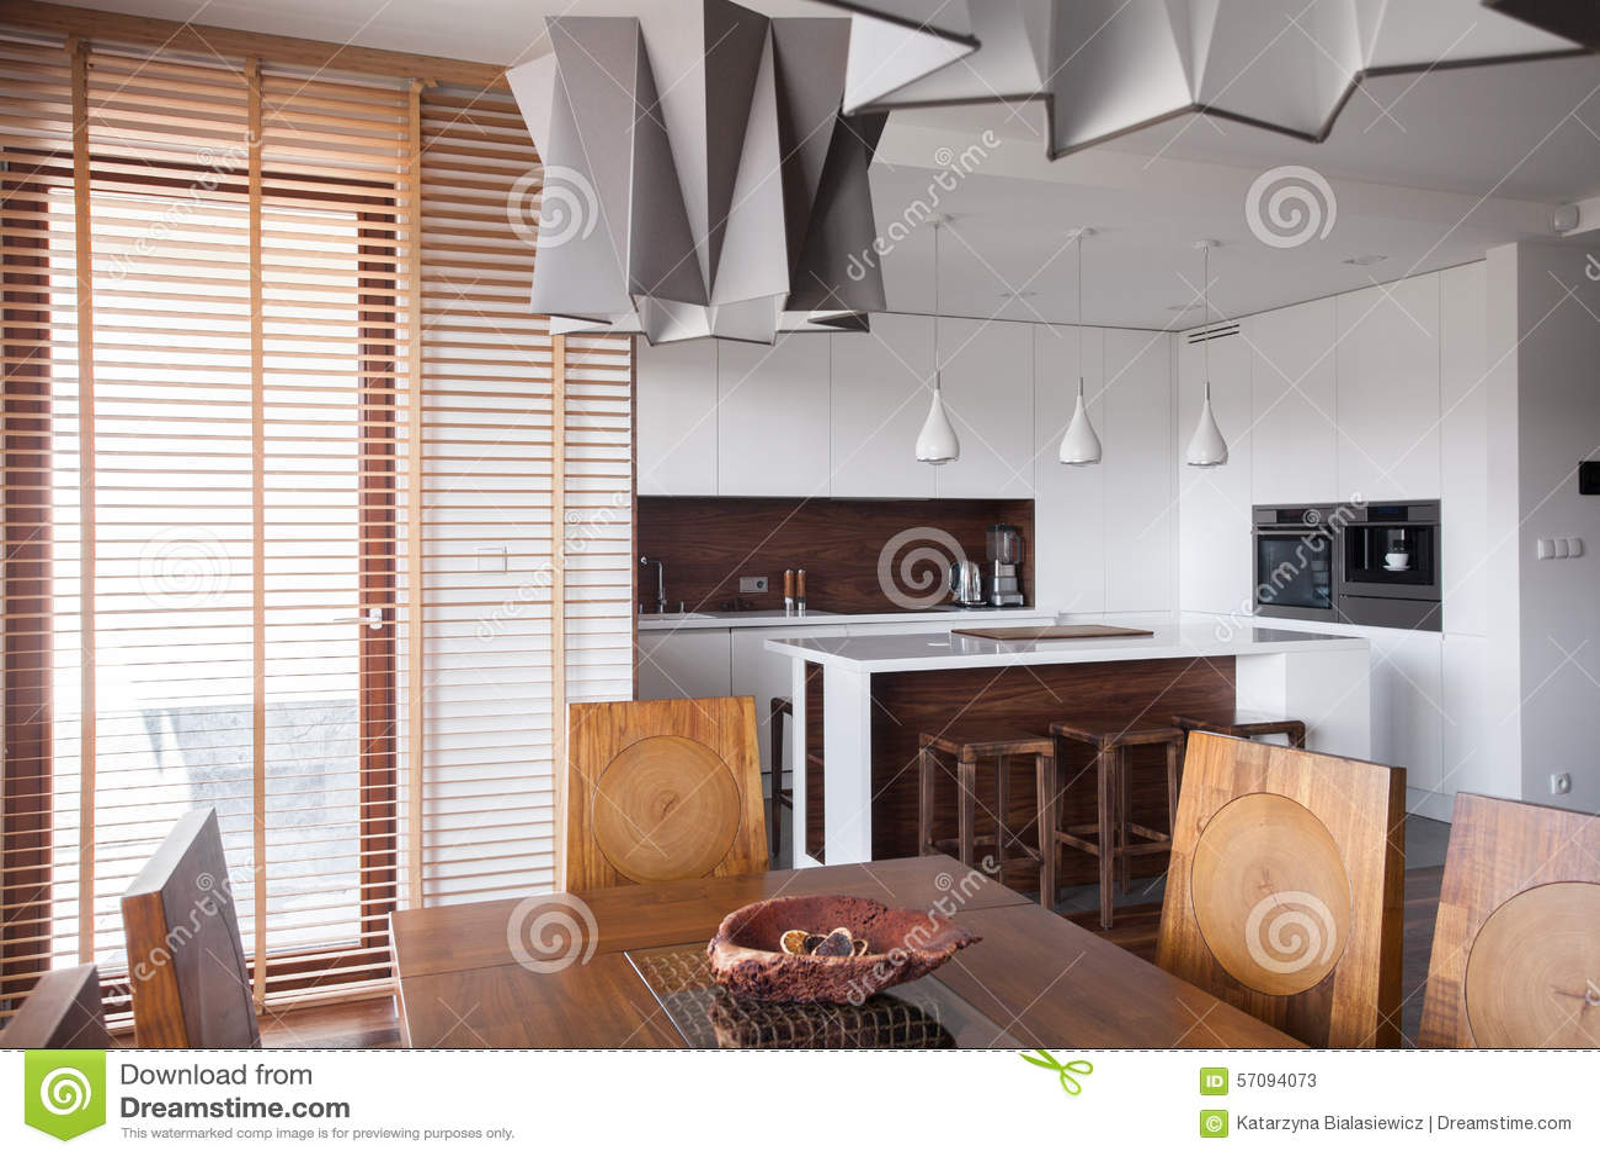 Moderne Keuken Lampen : Ontworpen lamp in moderne keuken stock afbeelding afbeelding